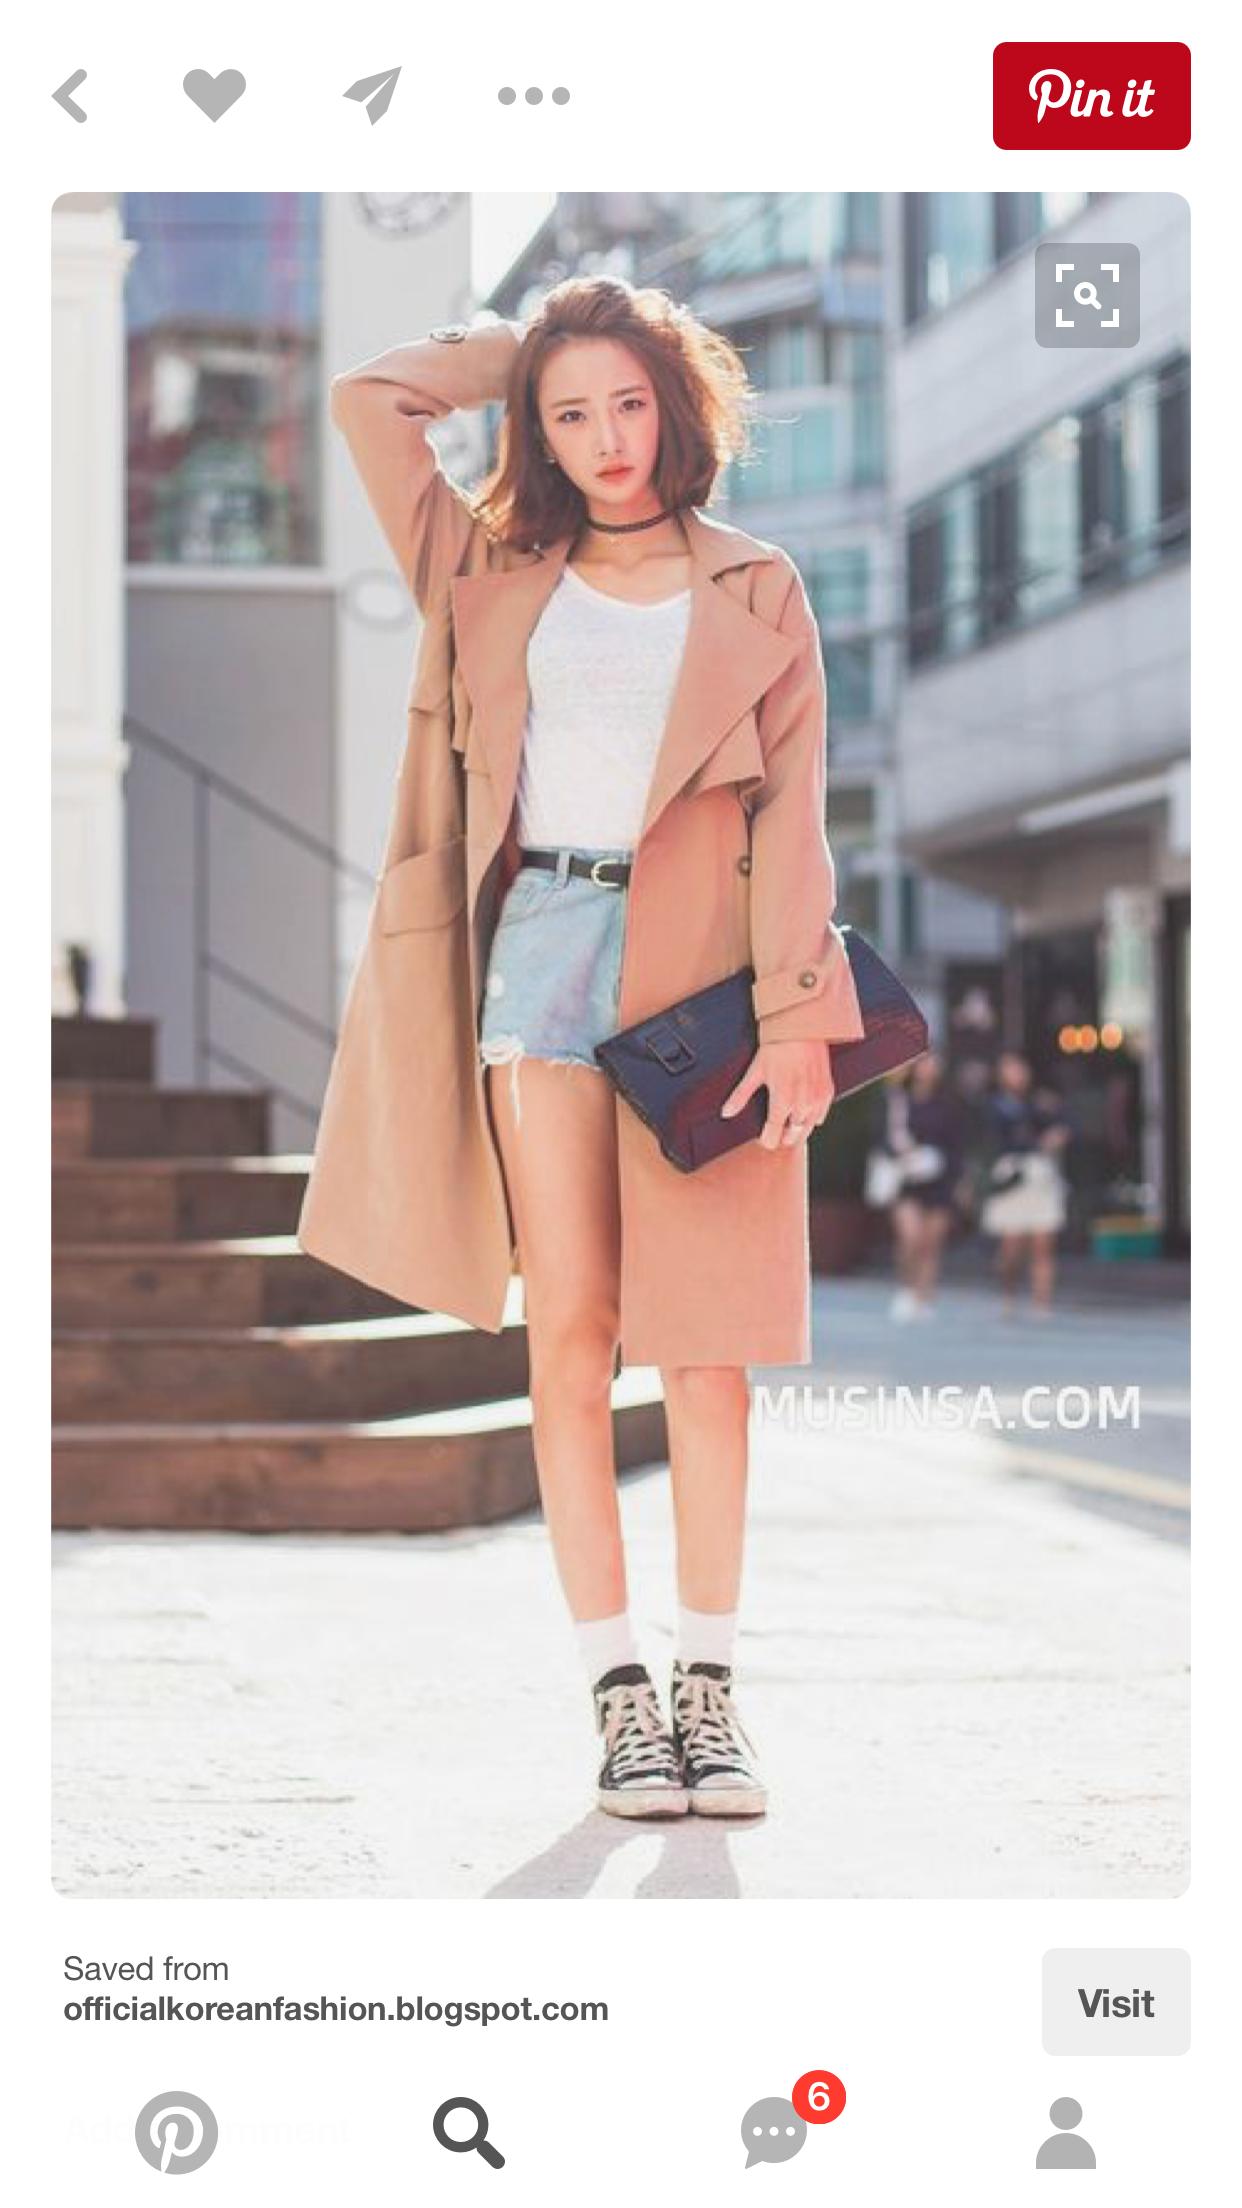 Korean fashion blog tumblr 69